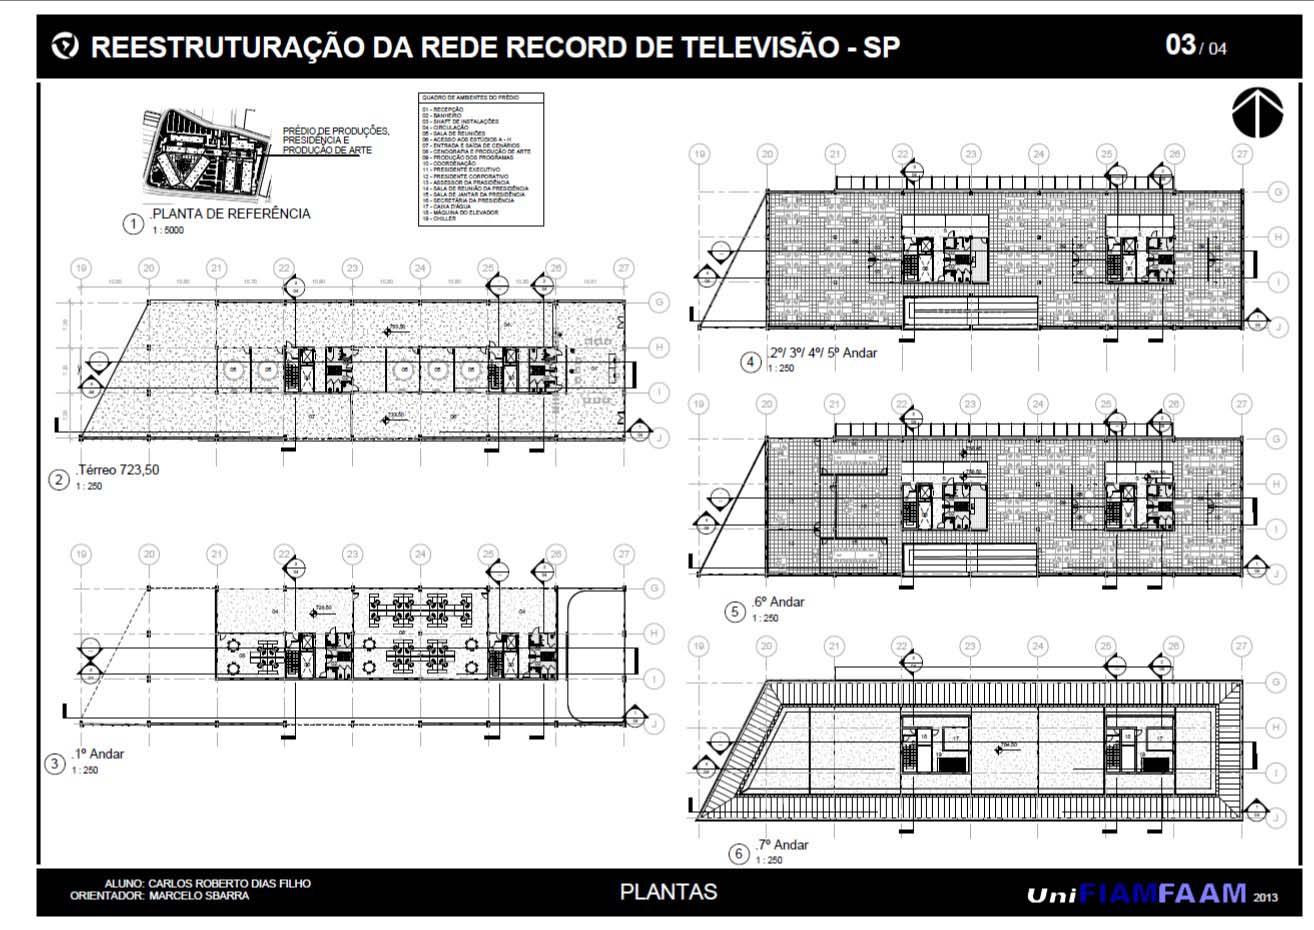 Rede Record - Prancha 03